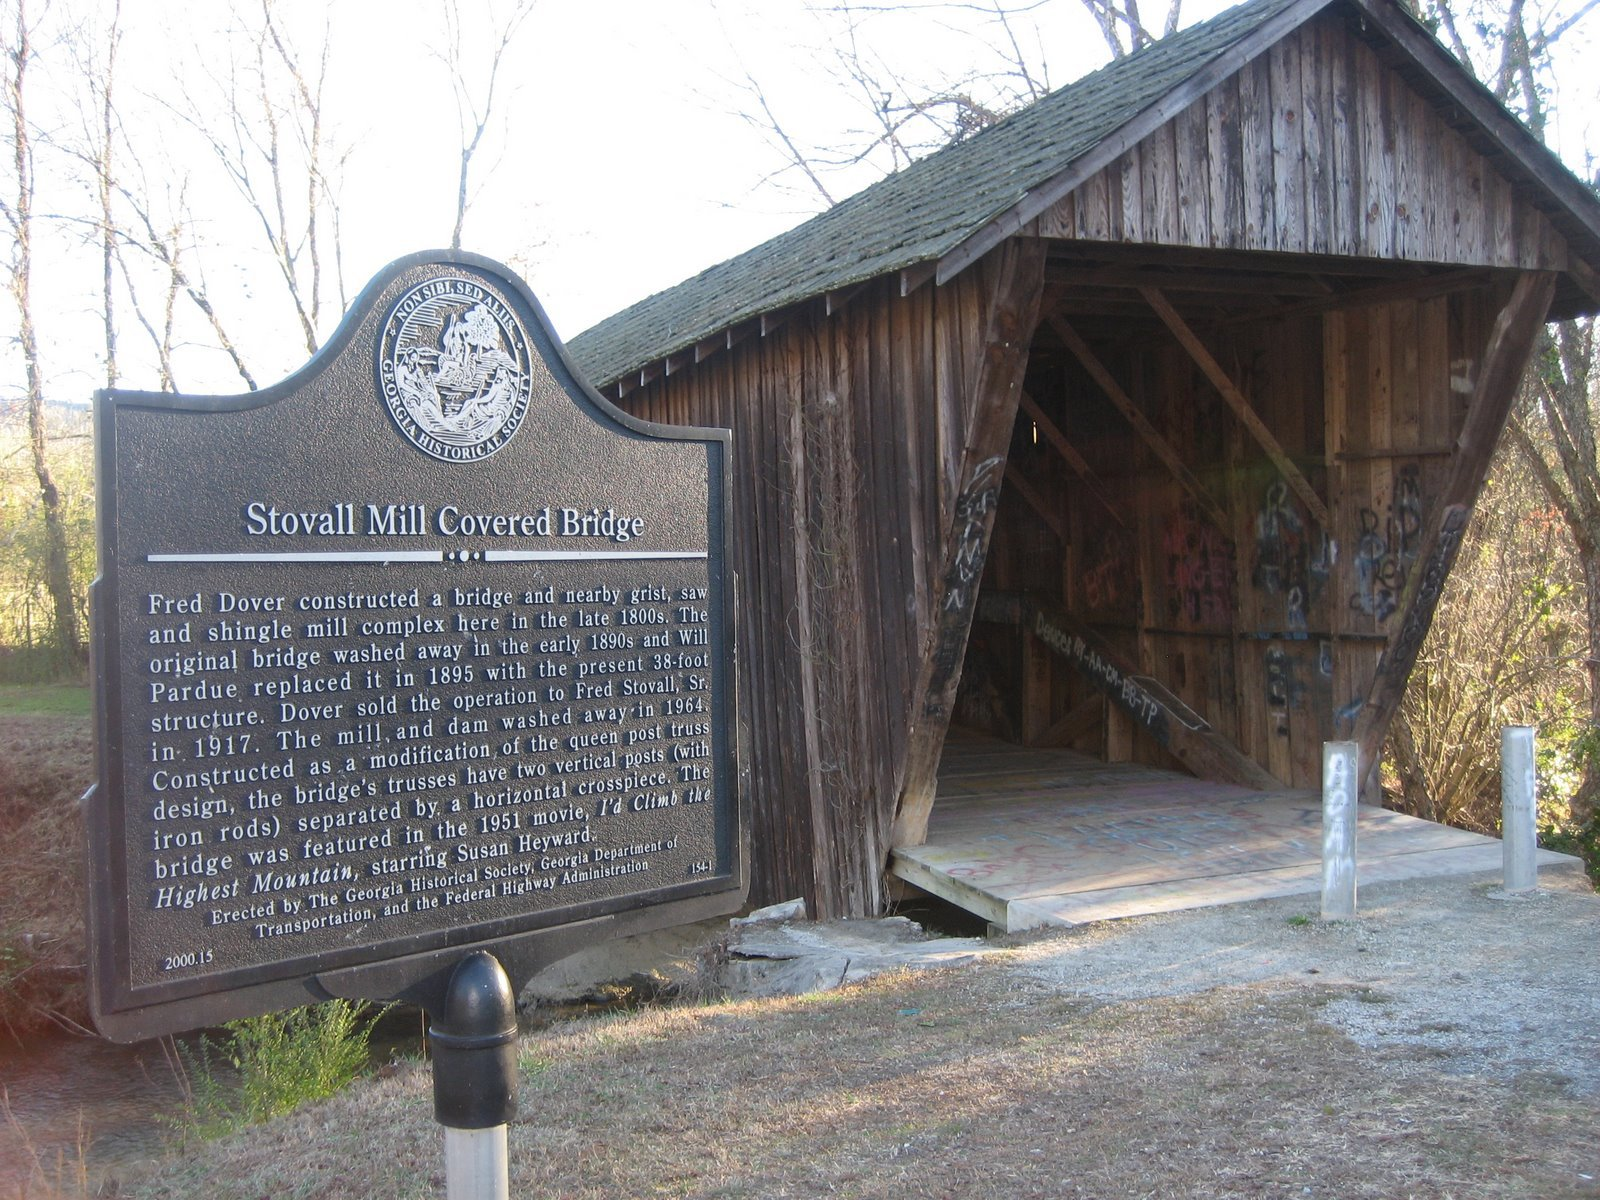 Stovall-Mill-bridge-2-728442.JPG